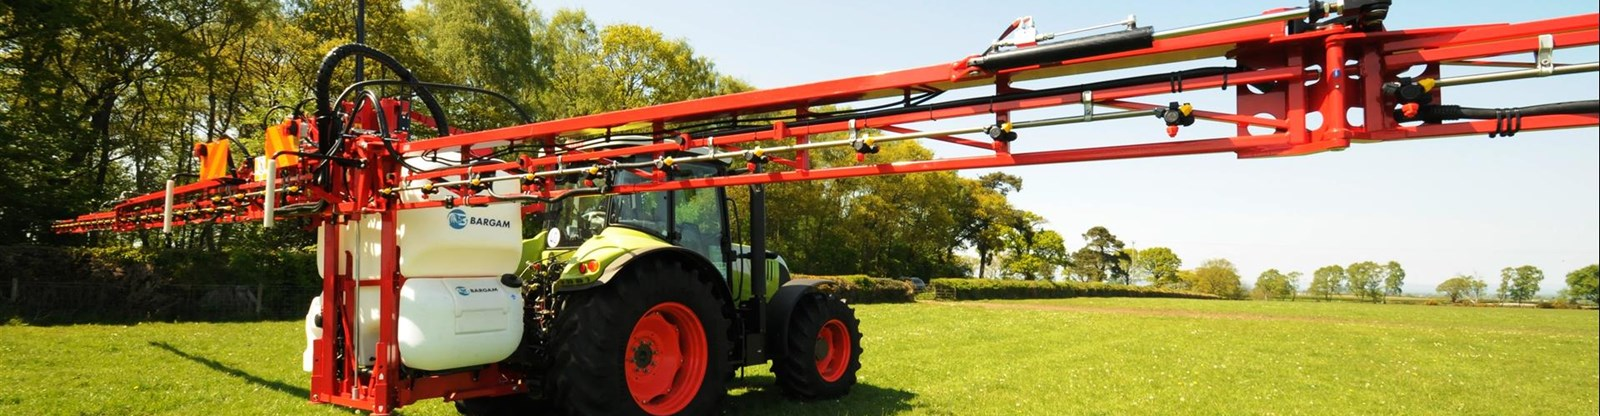 Tractor Mounted Sprayers | Bargam Sprayers